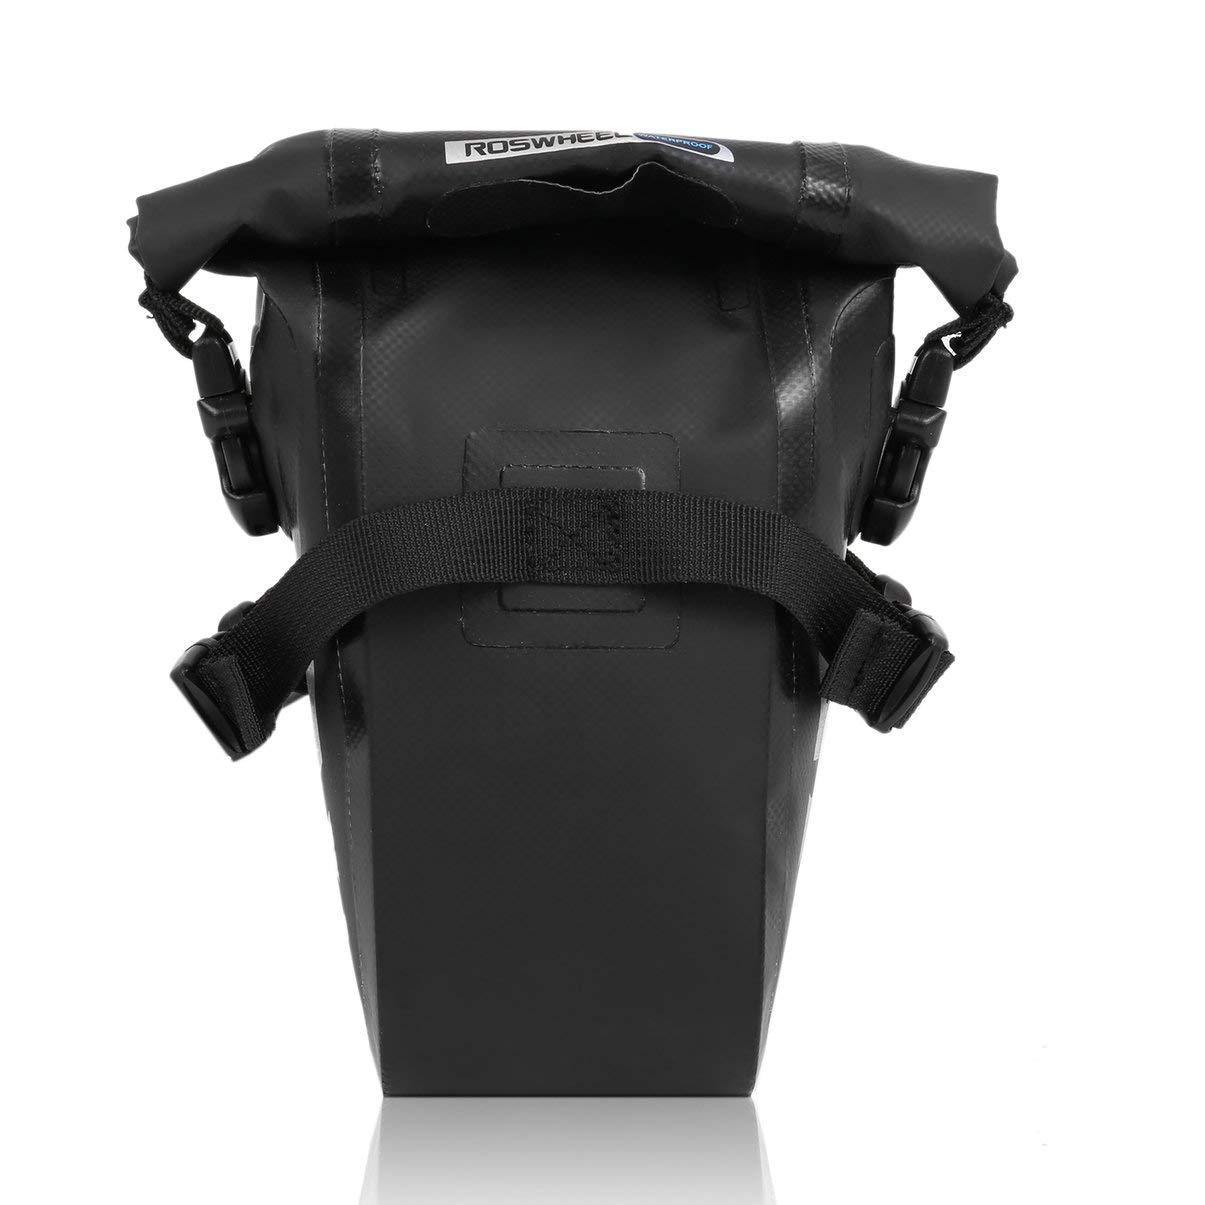 JullyeleESgant ROSWHEEL Dry Series Full Waterproof Bike Bicycle Cycling Bag Full Waterproof PVC Accessories Rear Tail Saddle Bag